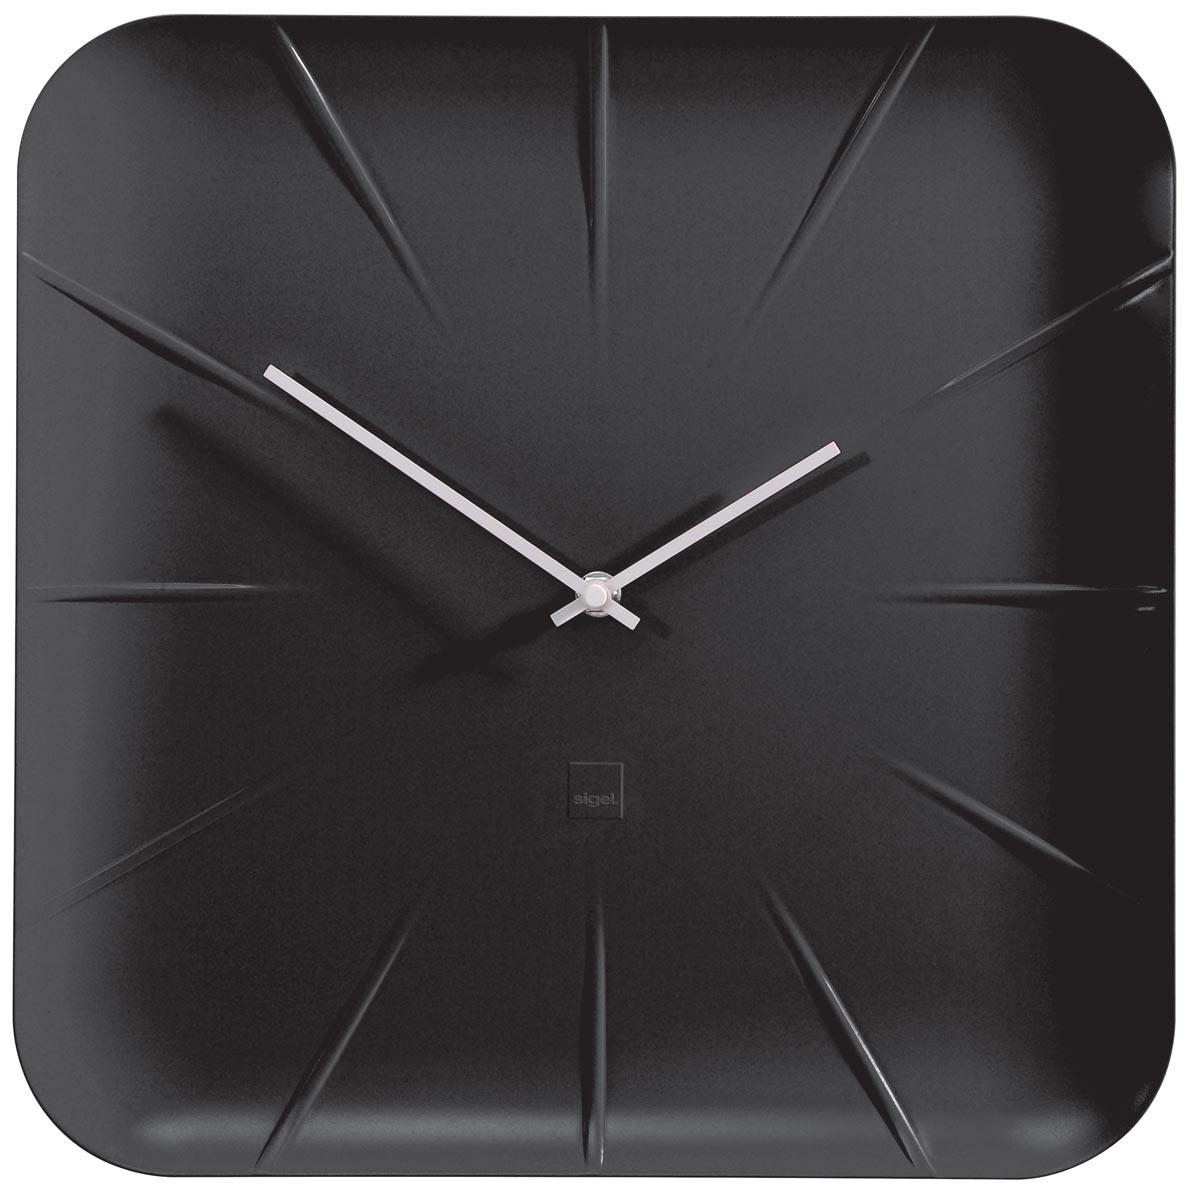 Sigel wandklok Inu, ft 35 x 35 x 4,5 cm, zwart